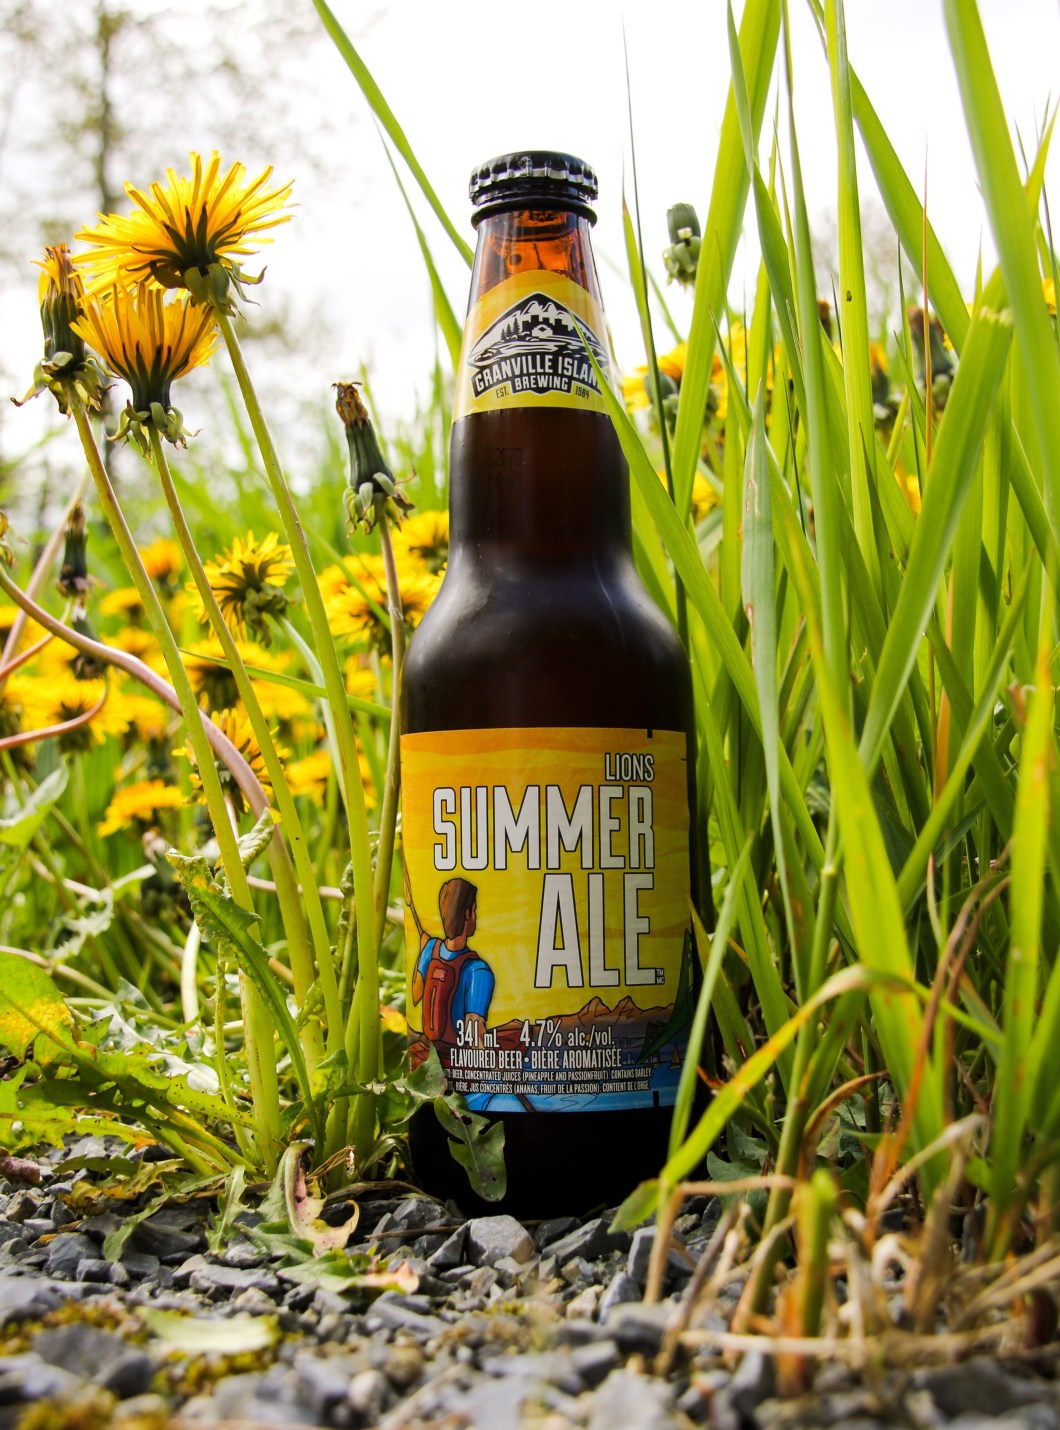 Granville island, brewery, Granville island beer, summer ale, beer